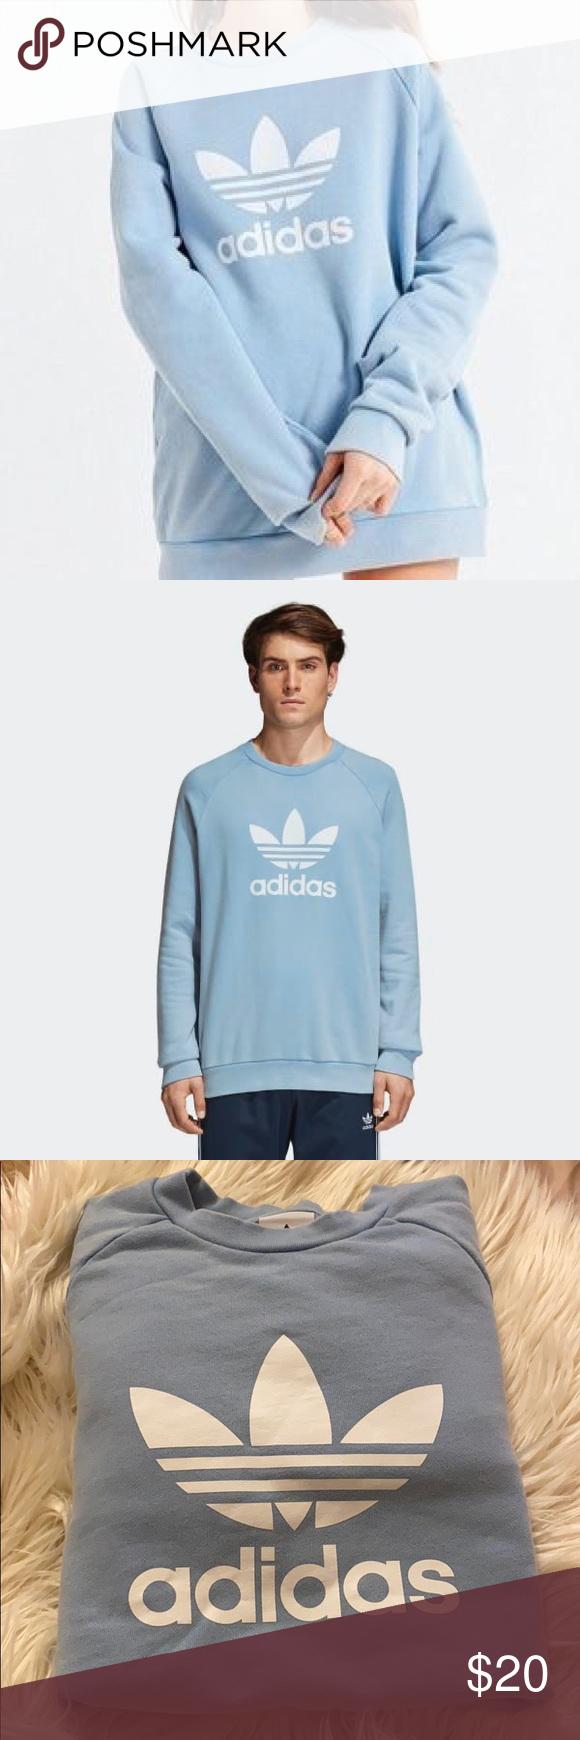 Euc Adidas Sweater Light Blue Adidas Sweater Sweaters Blue Adidas [ 1740 x 580 Pixel ]